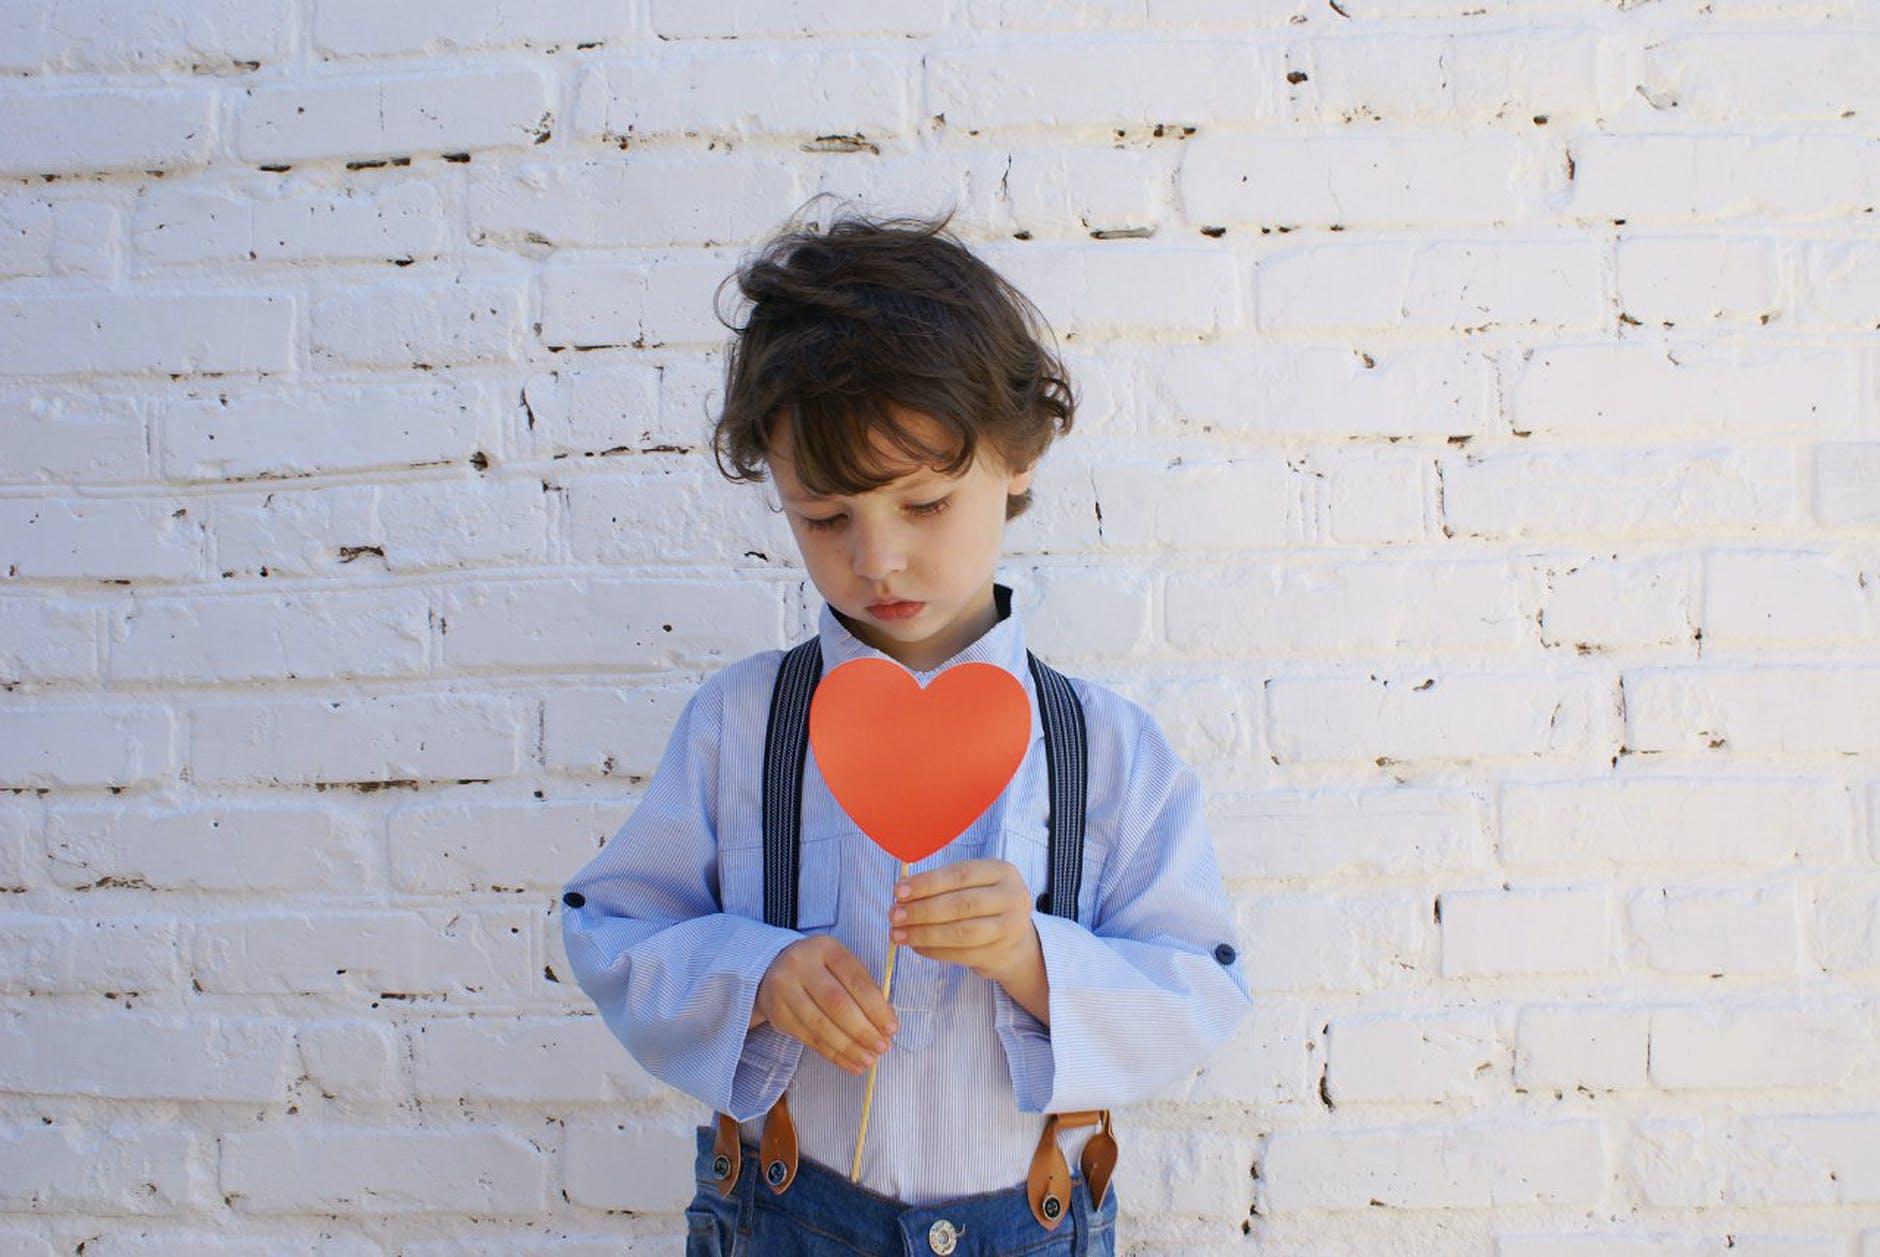 photo of boy holding heart shape paper on stick